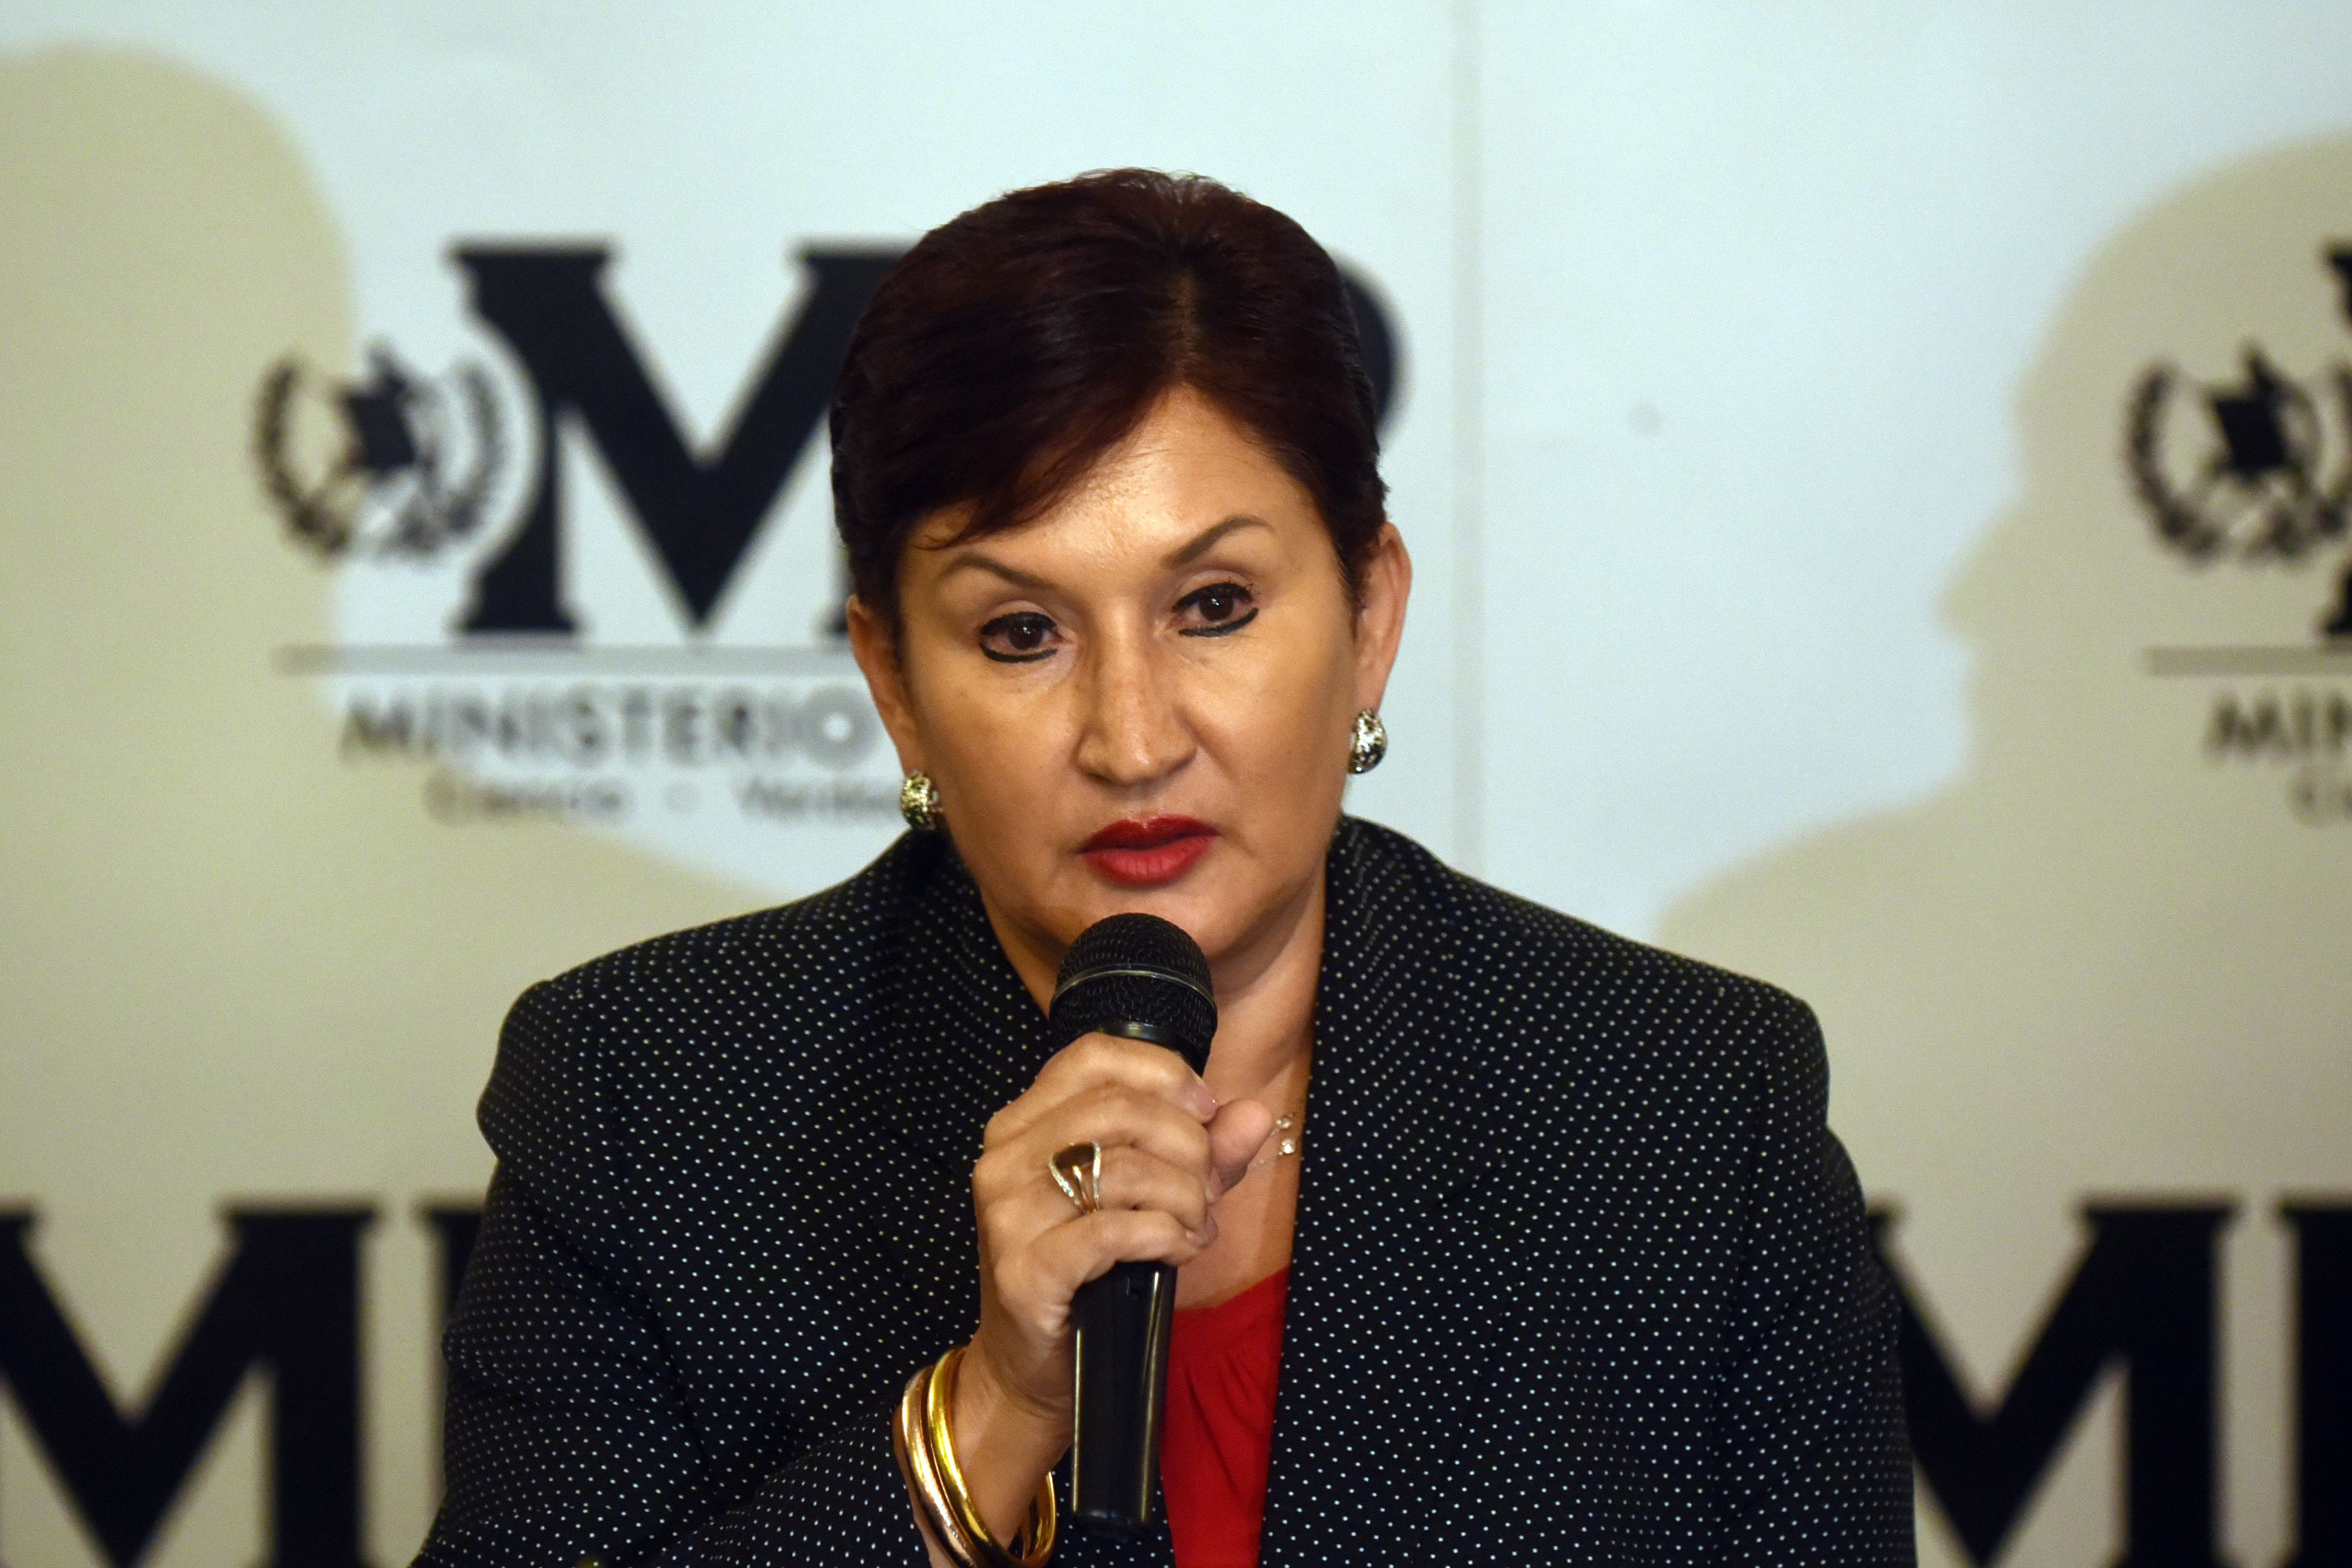 Thelma Aldana, fiscal general del Ministerio Público de Guatemala. (Crédito: JOHAN ORDÓÑEZ/AFP/Getty Images)